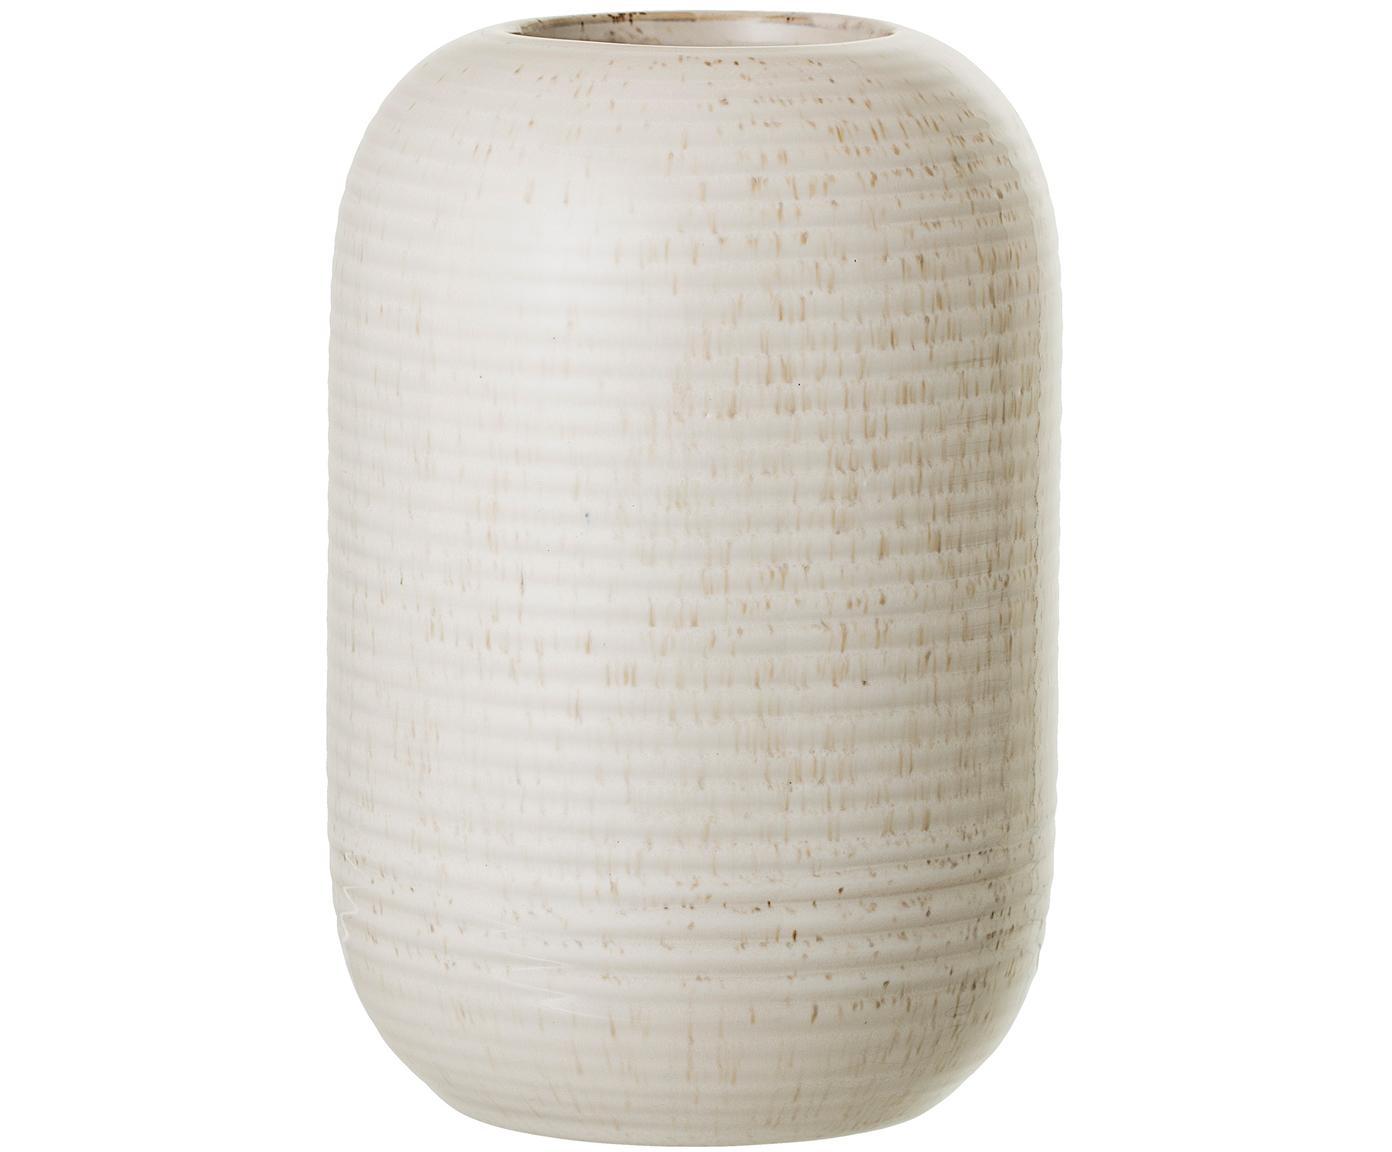 Vaso in terracotta beige Aya, Gres, Beige, Ø 11 x Alt. 17 cm